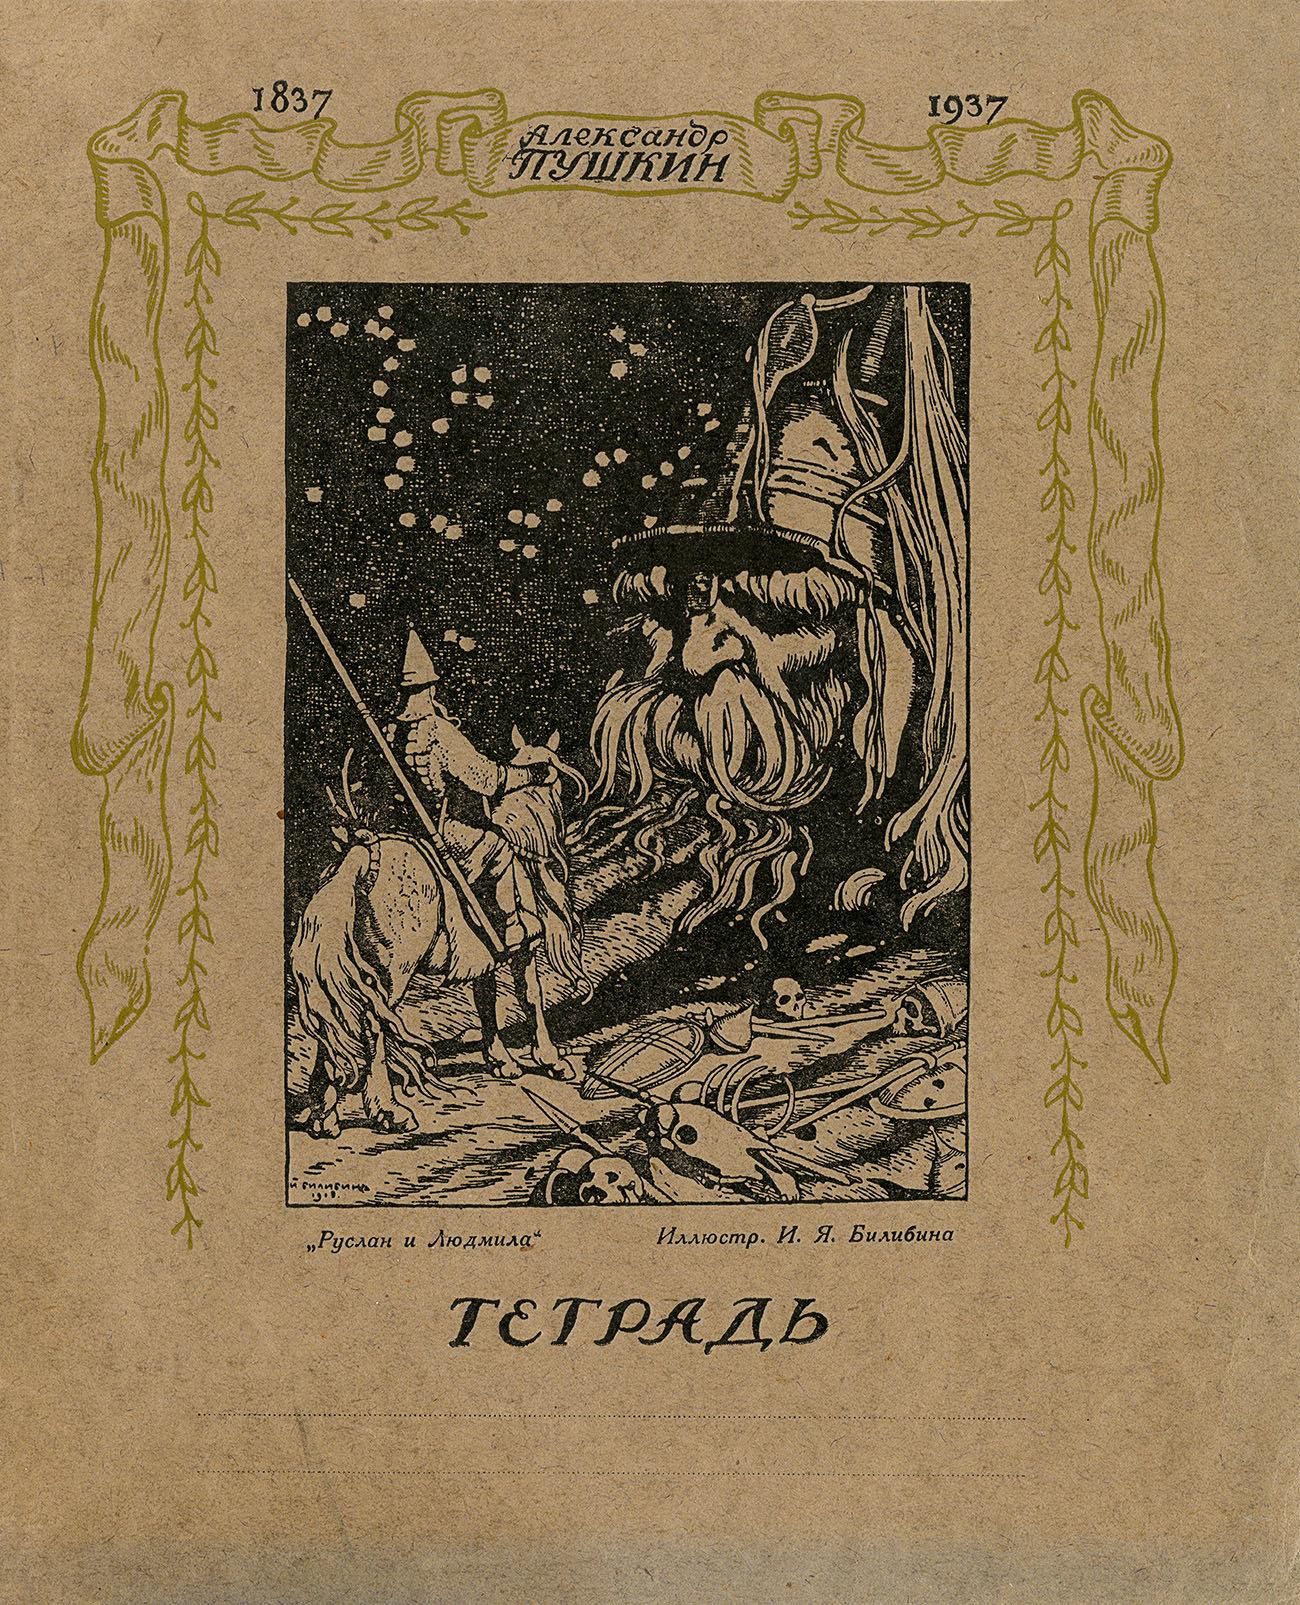 Тетрадь магазин Курылев Саратов, 175х220